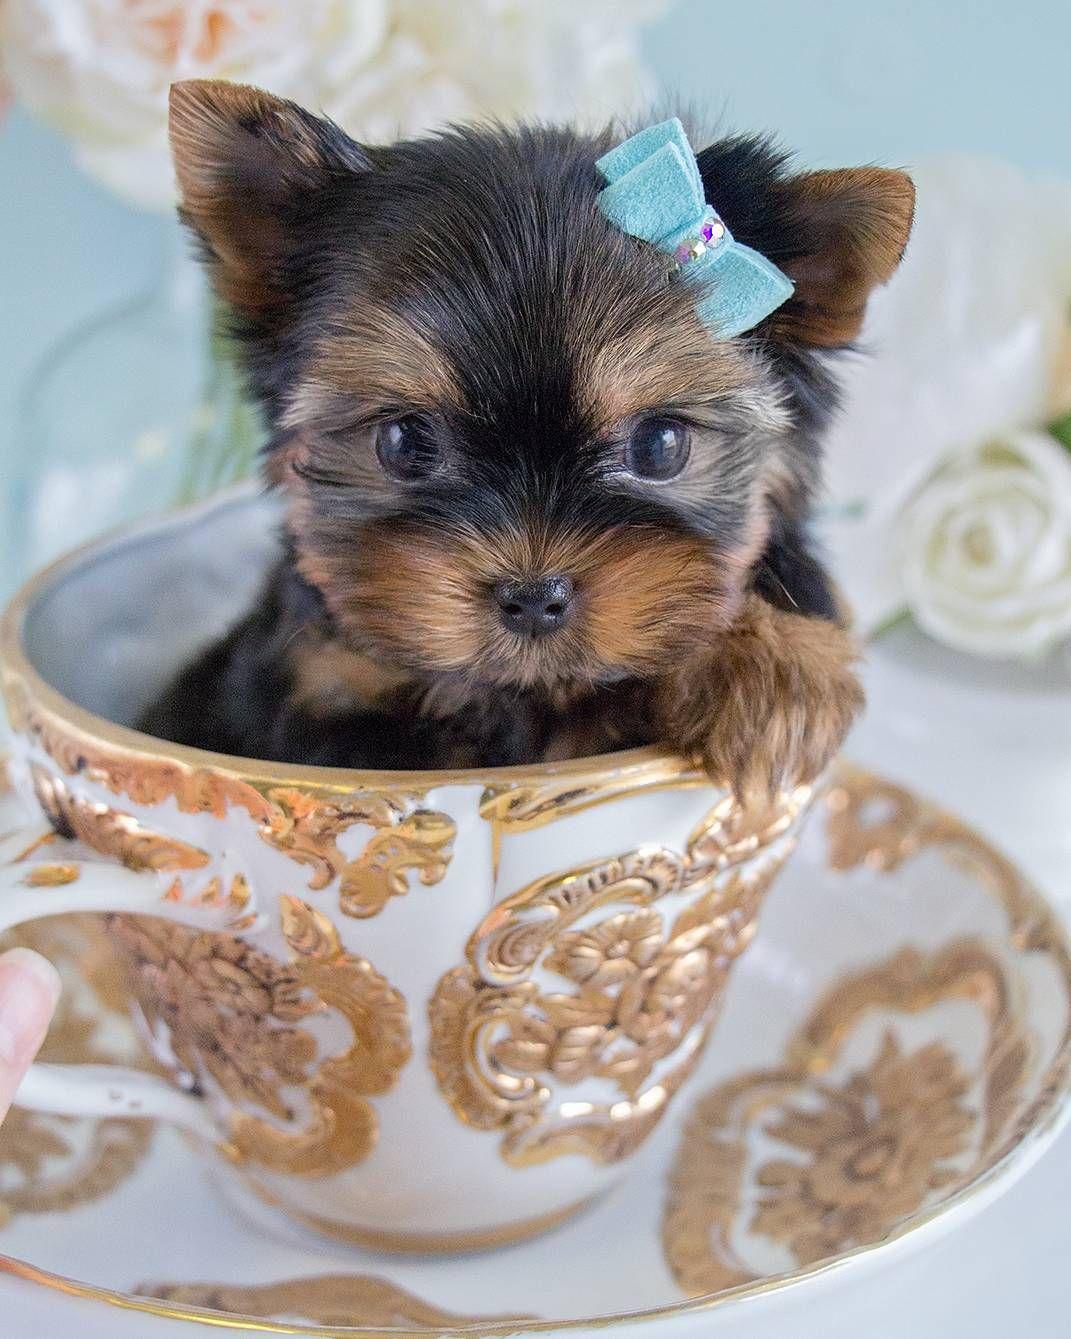 25 Teddy Bear Dog Breeds Shichon Morkie Cockapoo Teacup Puppies Yorkie Puppy Teacup Yorkie Puppy